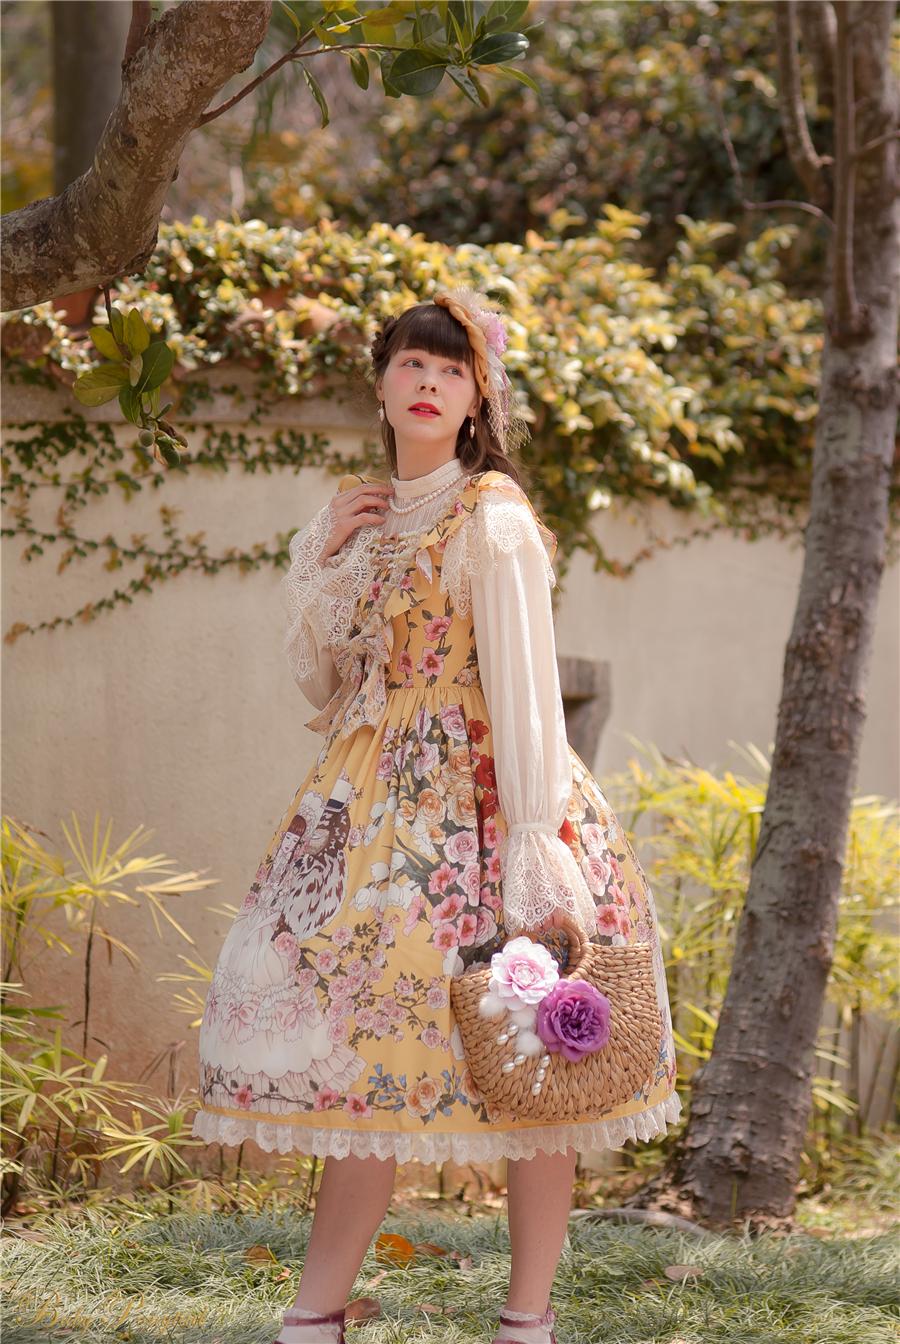 Baby Ponytail_Model Photo_Polly's Garden of Dreams_JSK Yellow_Claudia_10.jpg